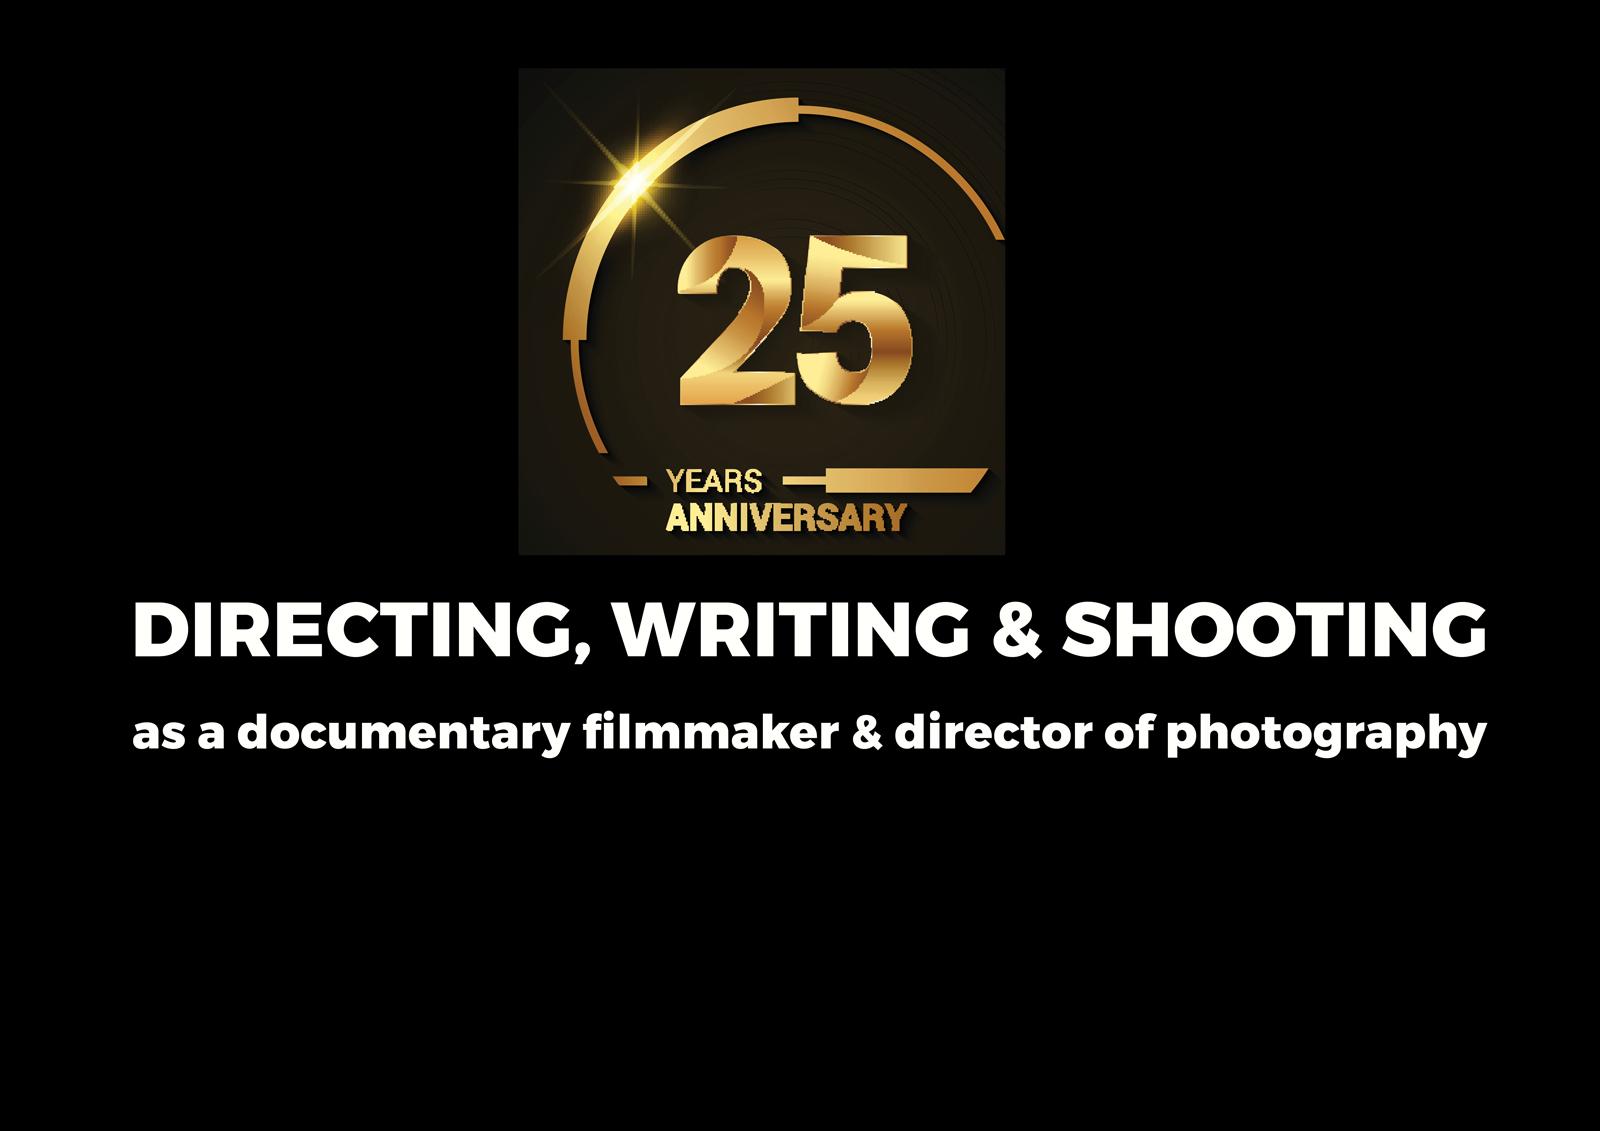 25 YEARS DIRECTING, WRITING & SHOOTING